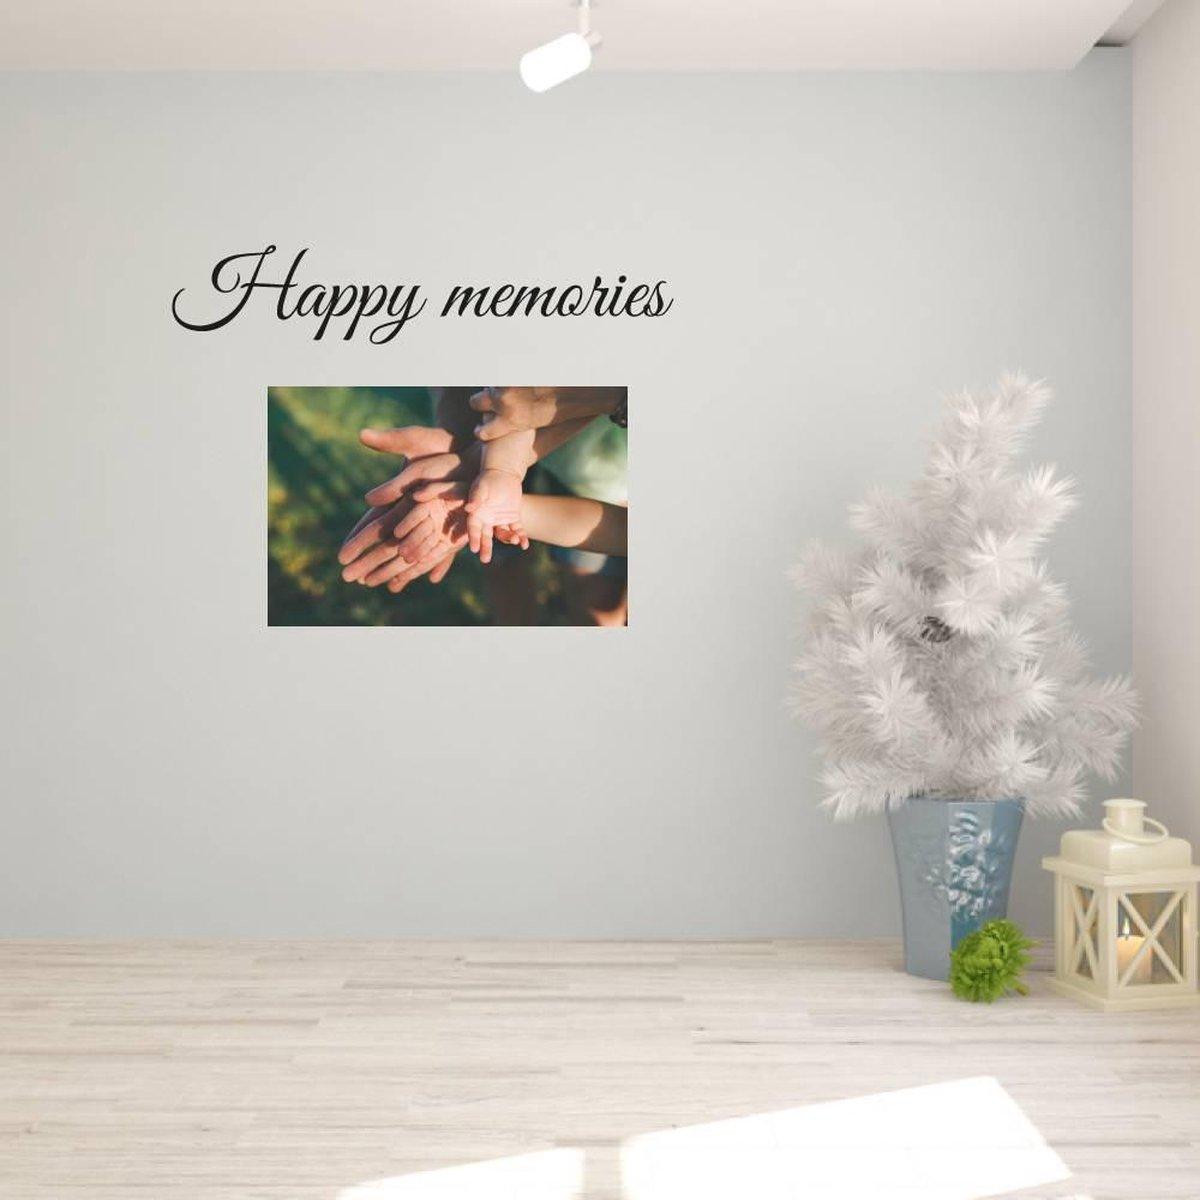 Muursticker Happy Memories -  Rood -  160 x 31 cm  -  engelse teksten  woonkamer   - Muursticker4Sale